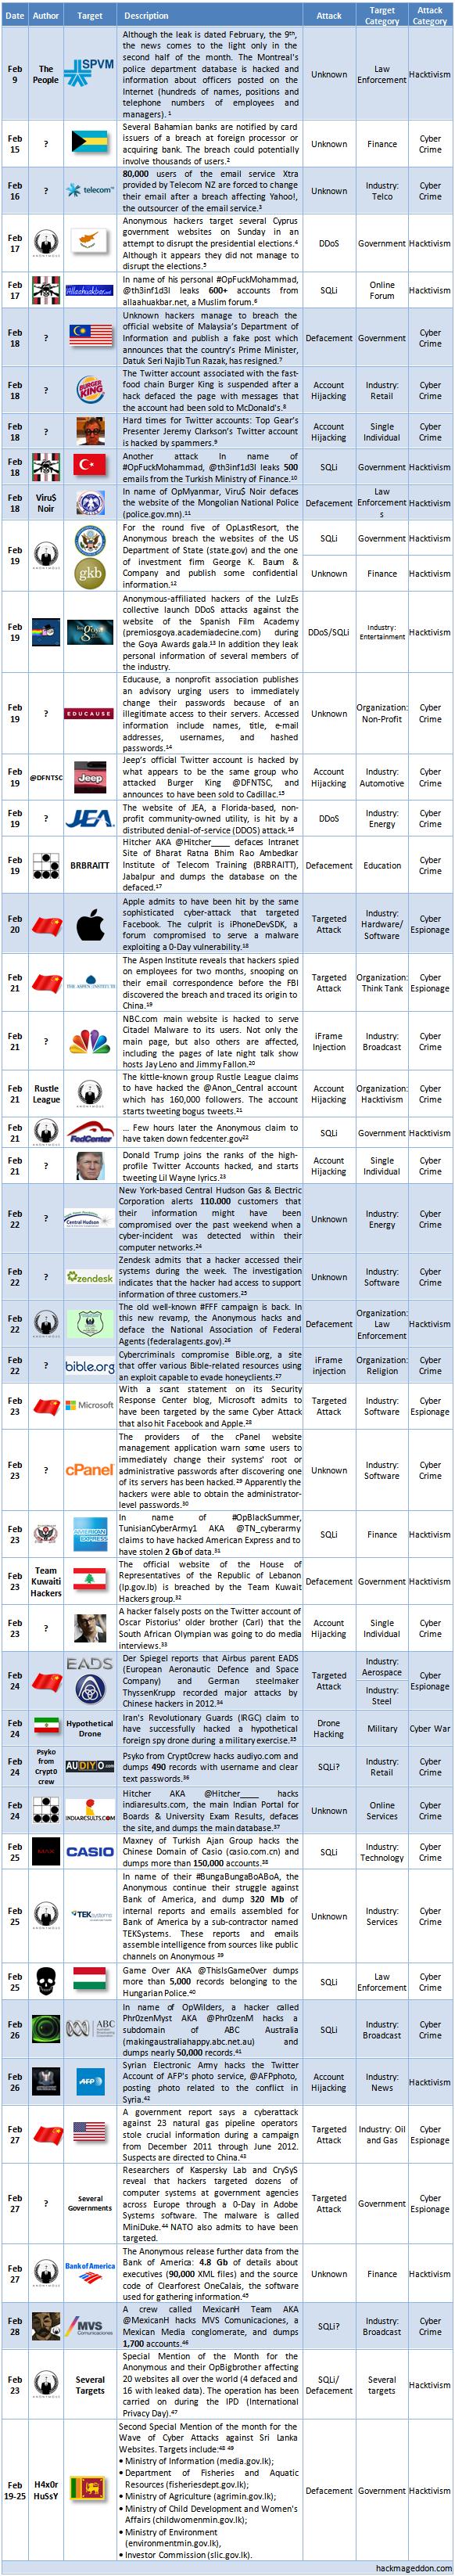 16-28 February 2013 Cyber Attacks Timeline